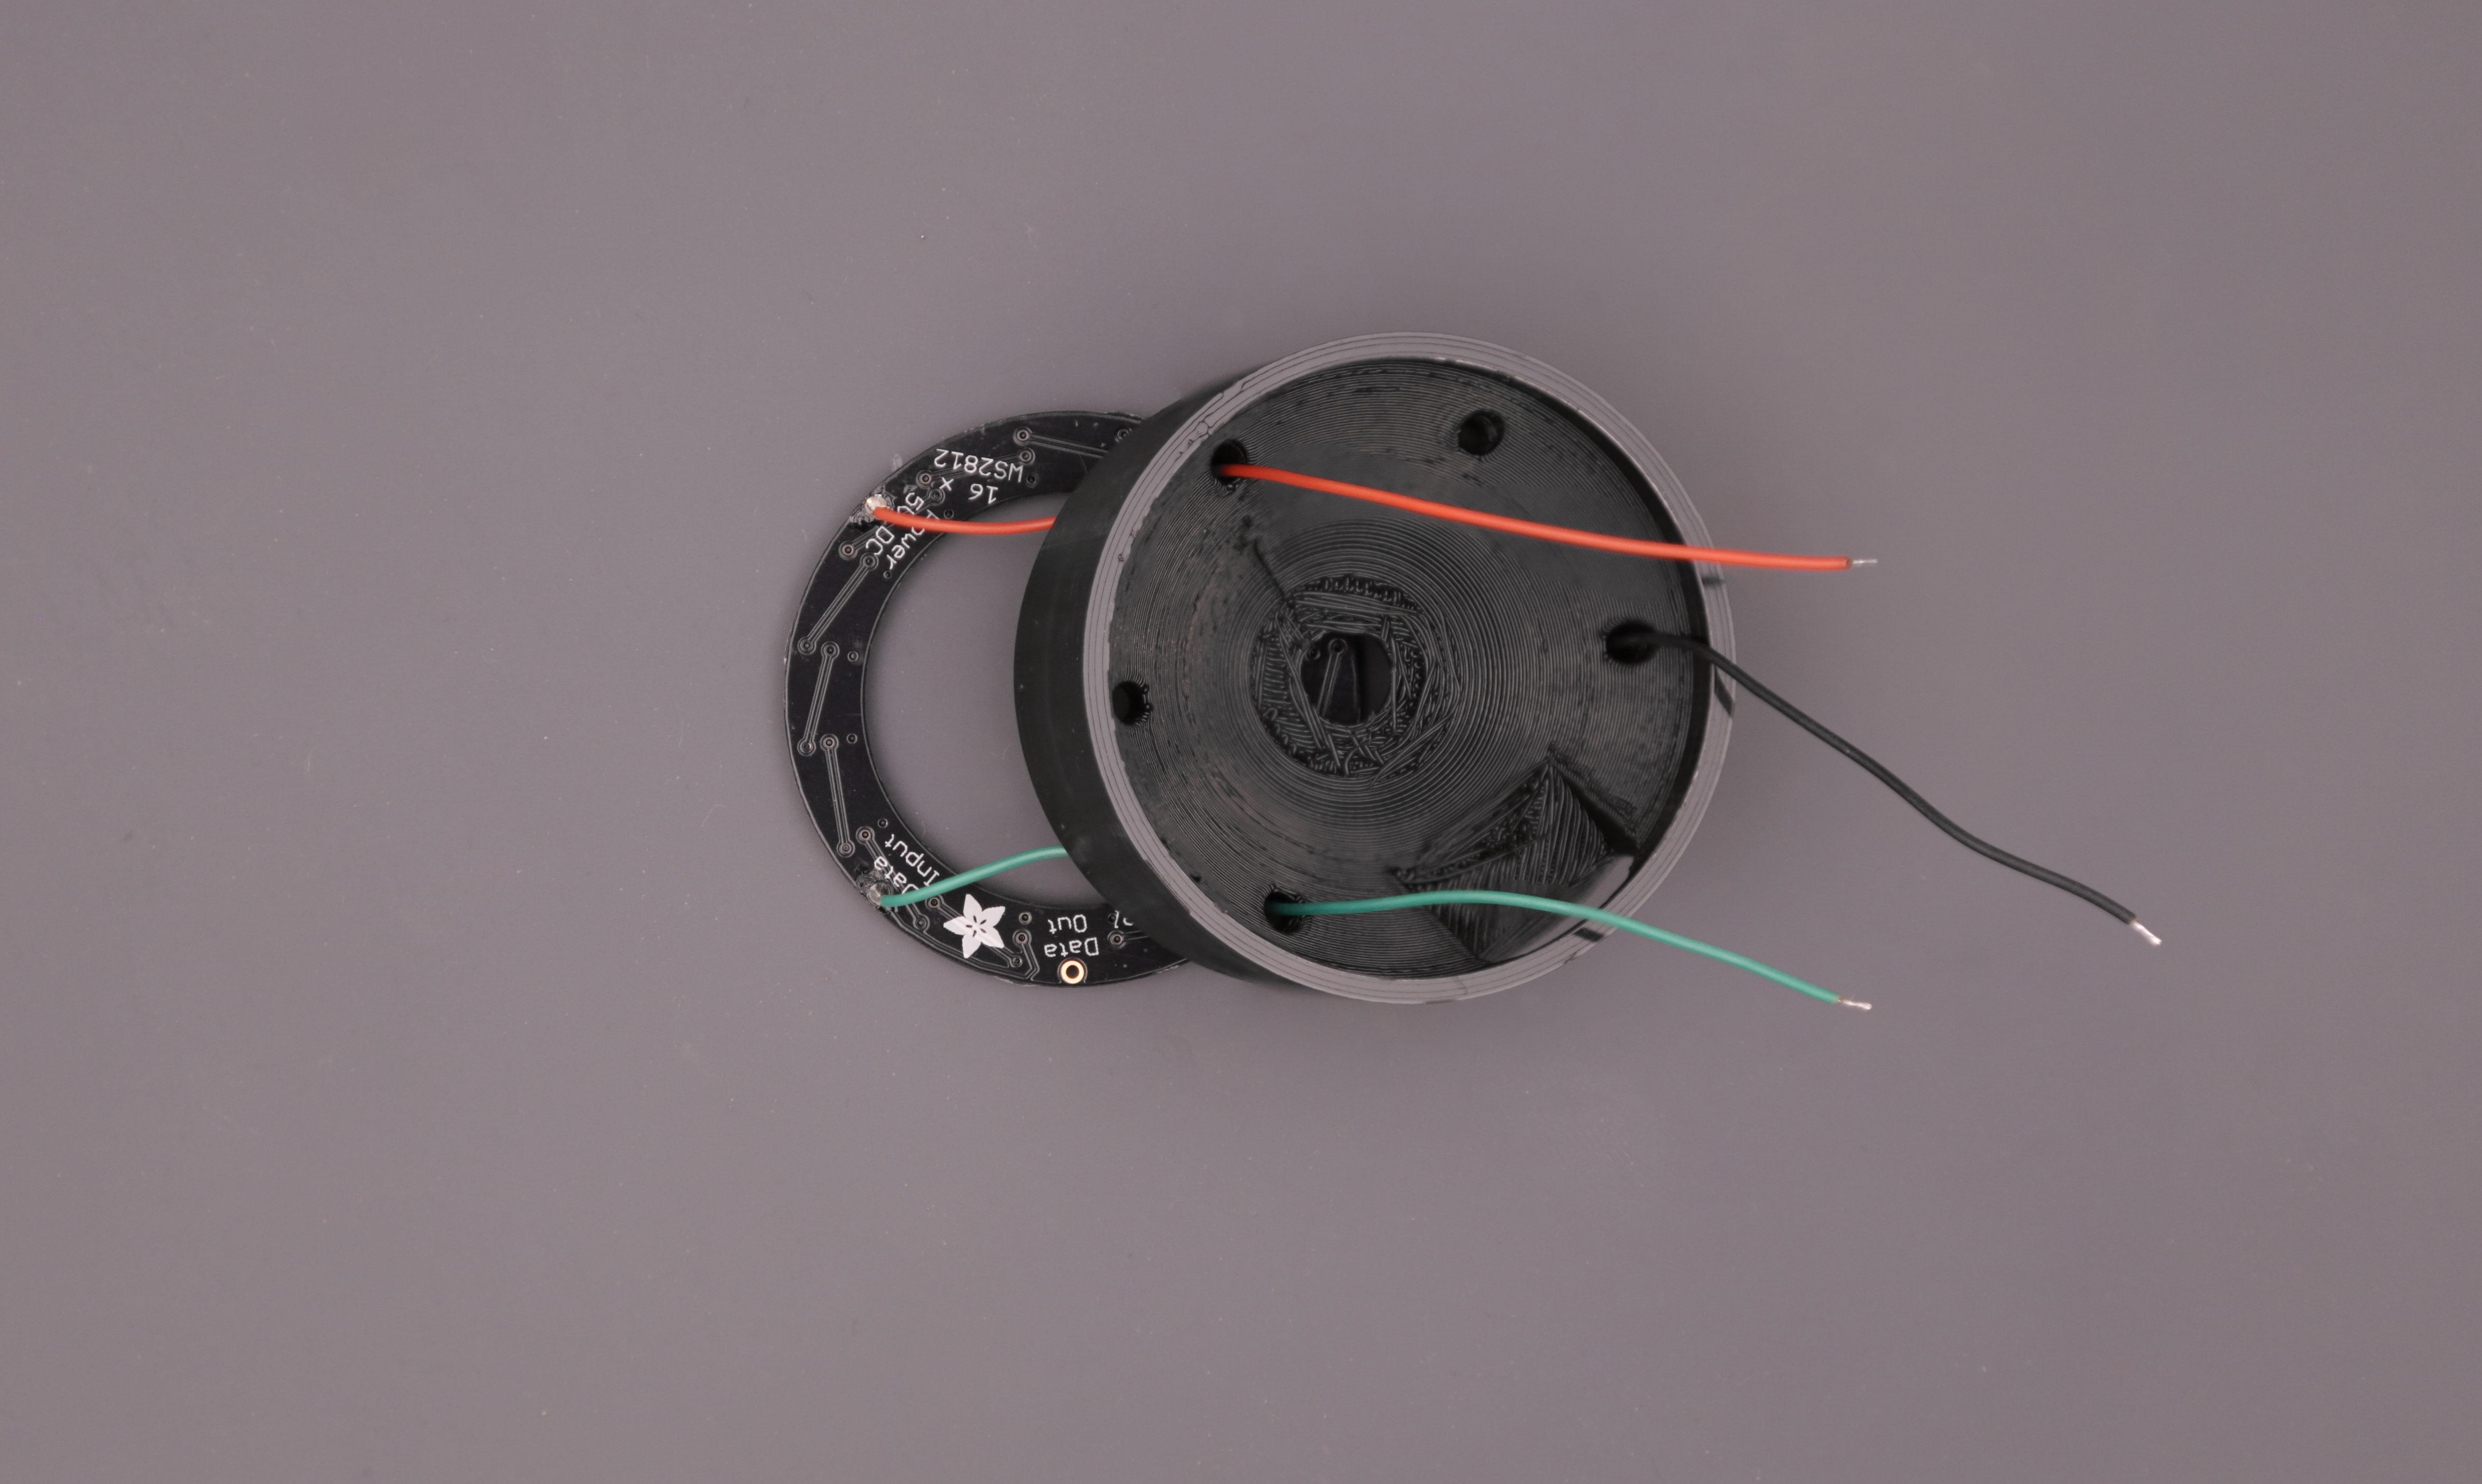 3d_printing_ring-wires-throu-case.jpg